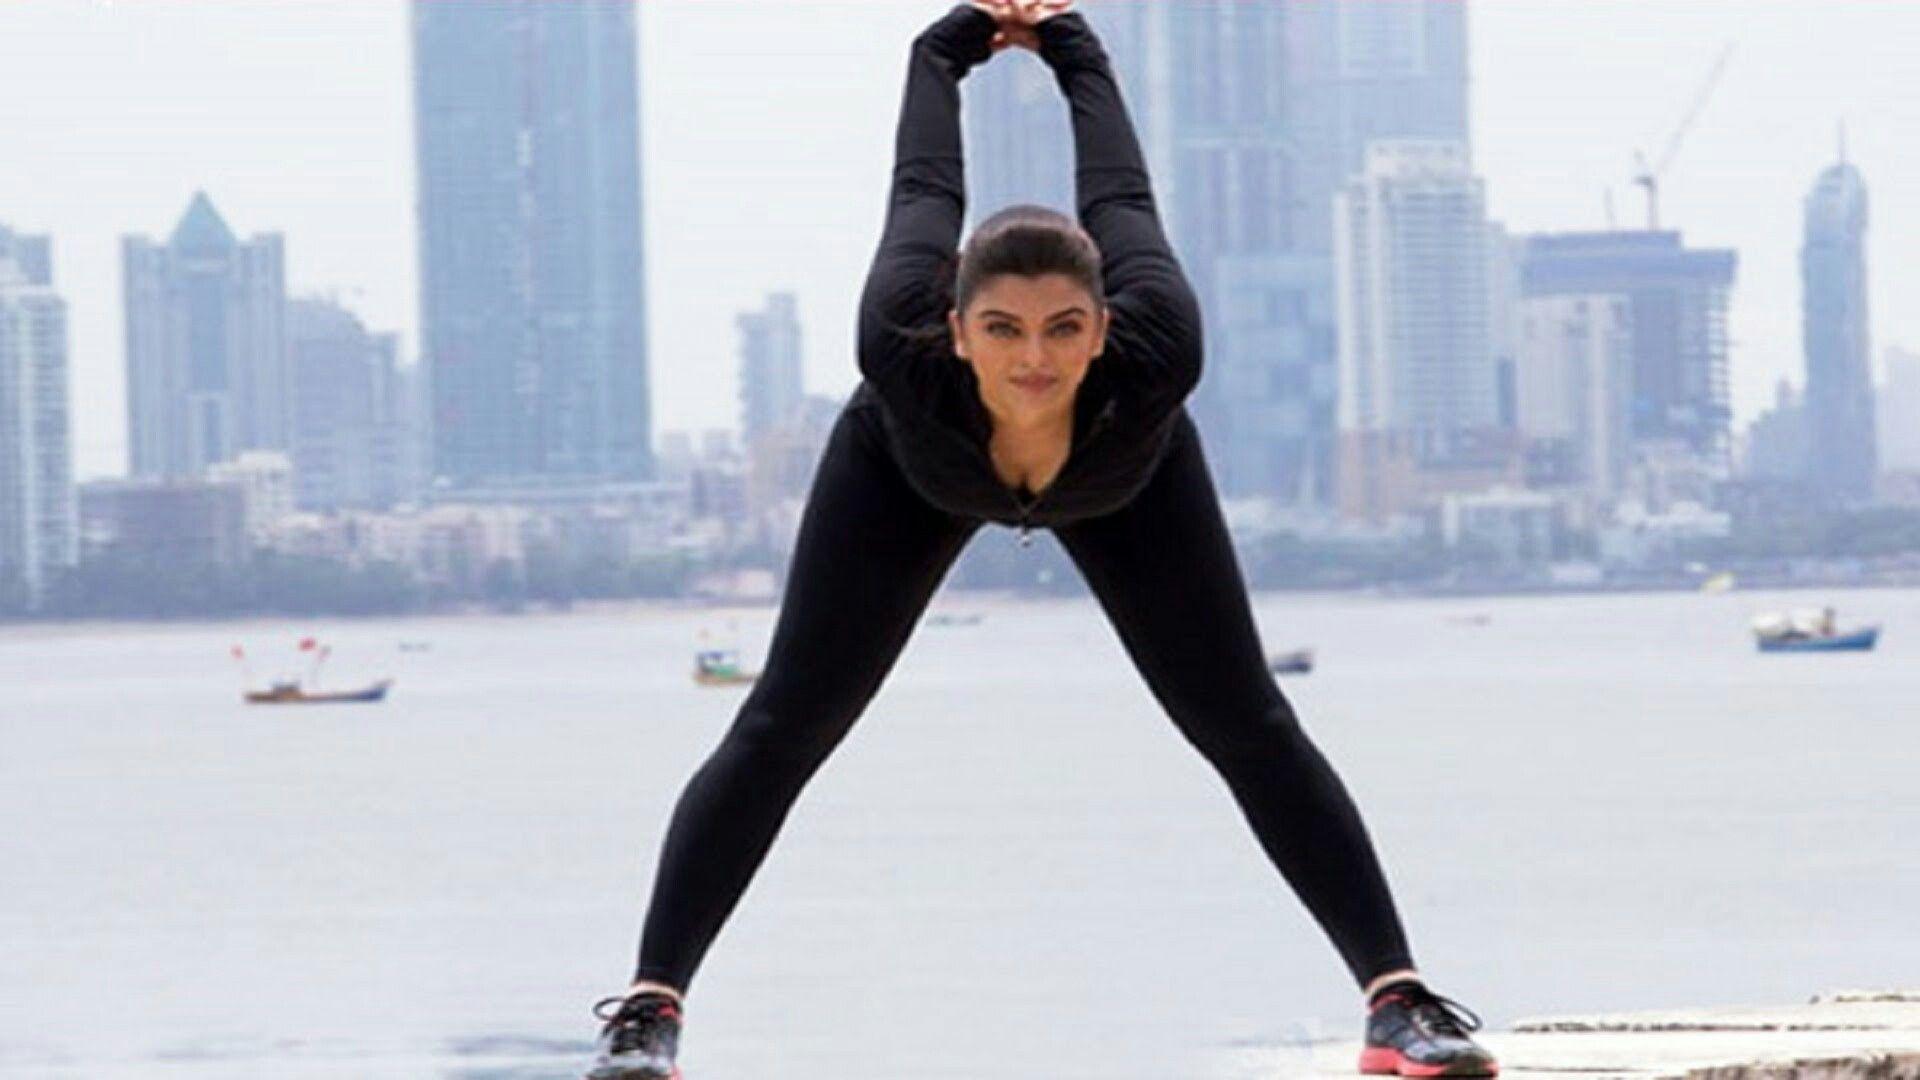 Aishwarya Rai doing yoga | Aishwarya rai, Model, Fashion